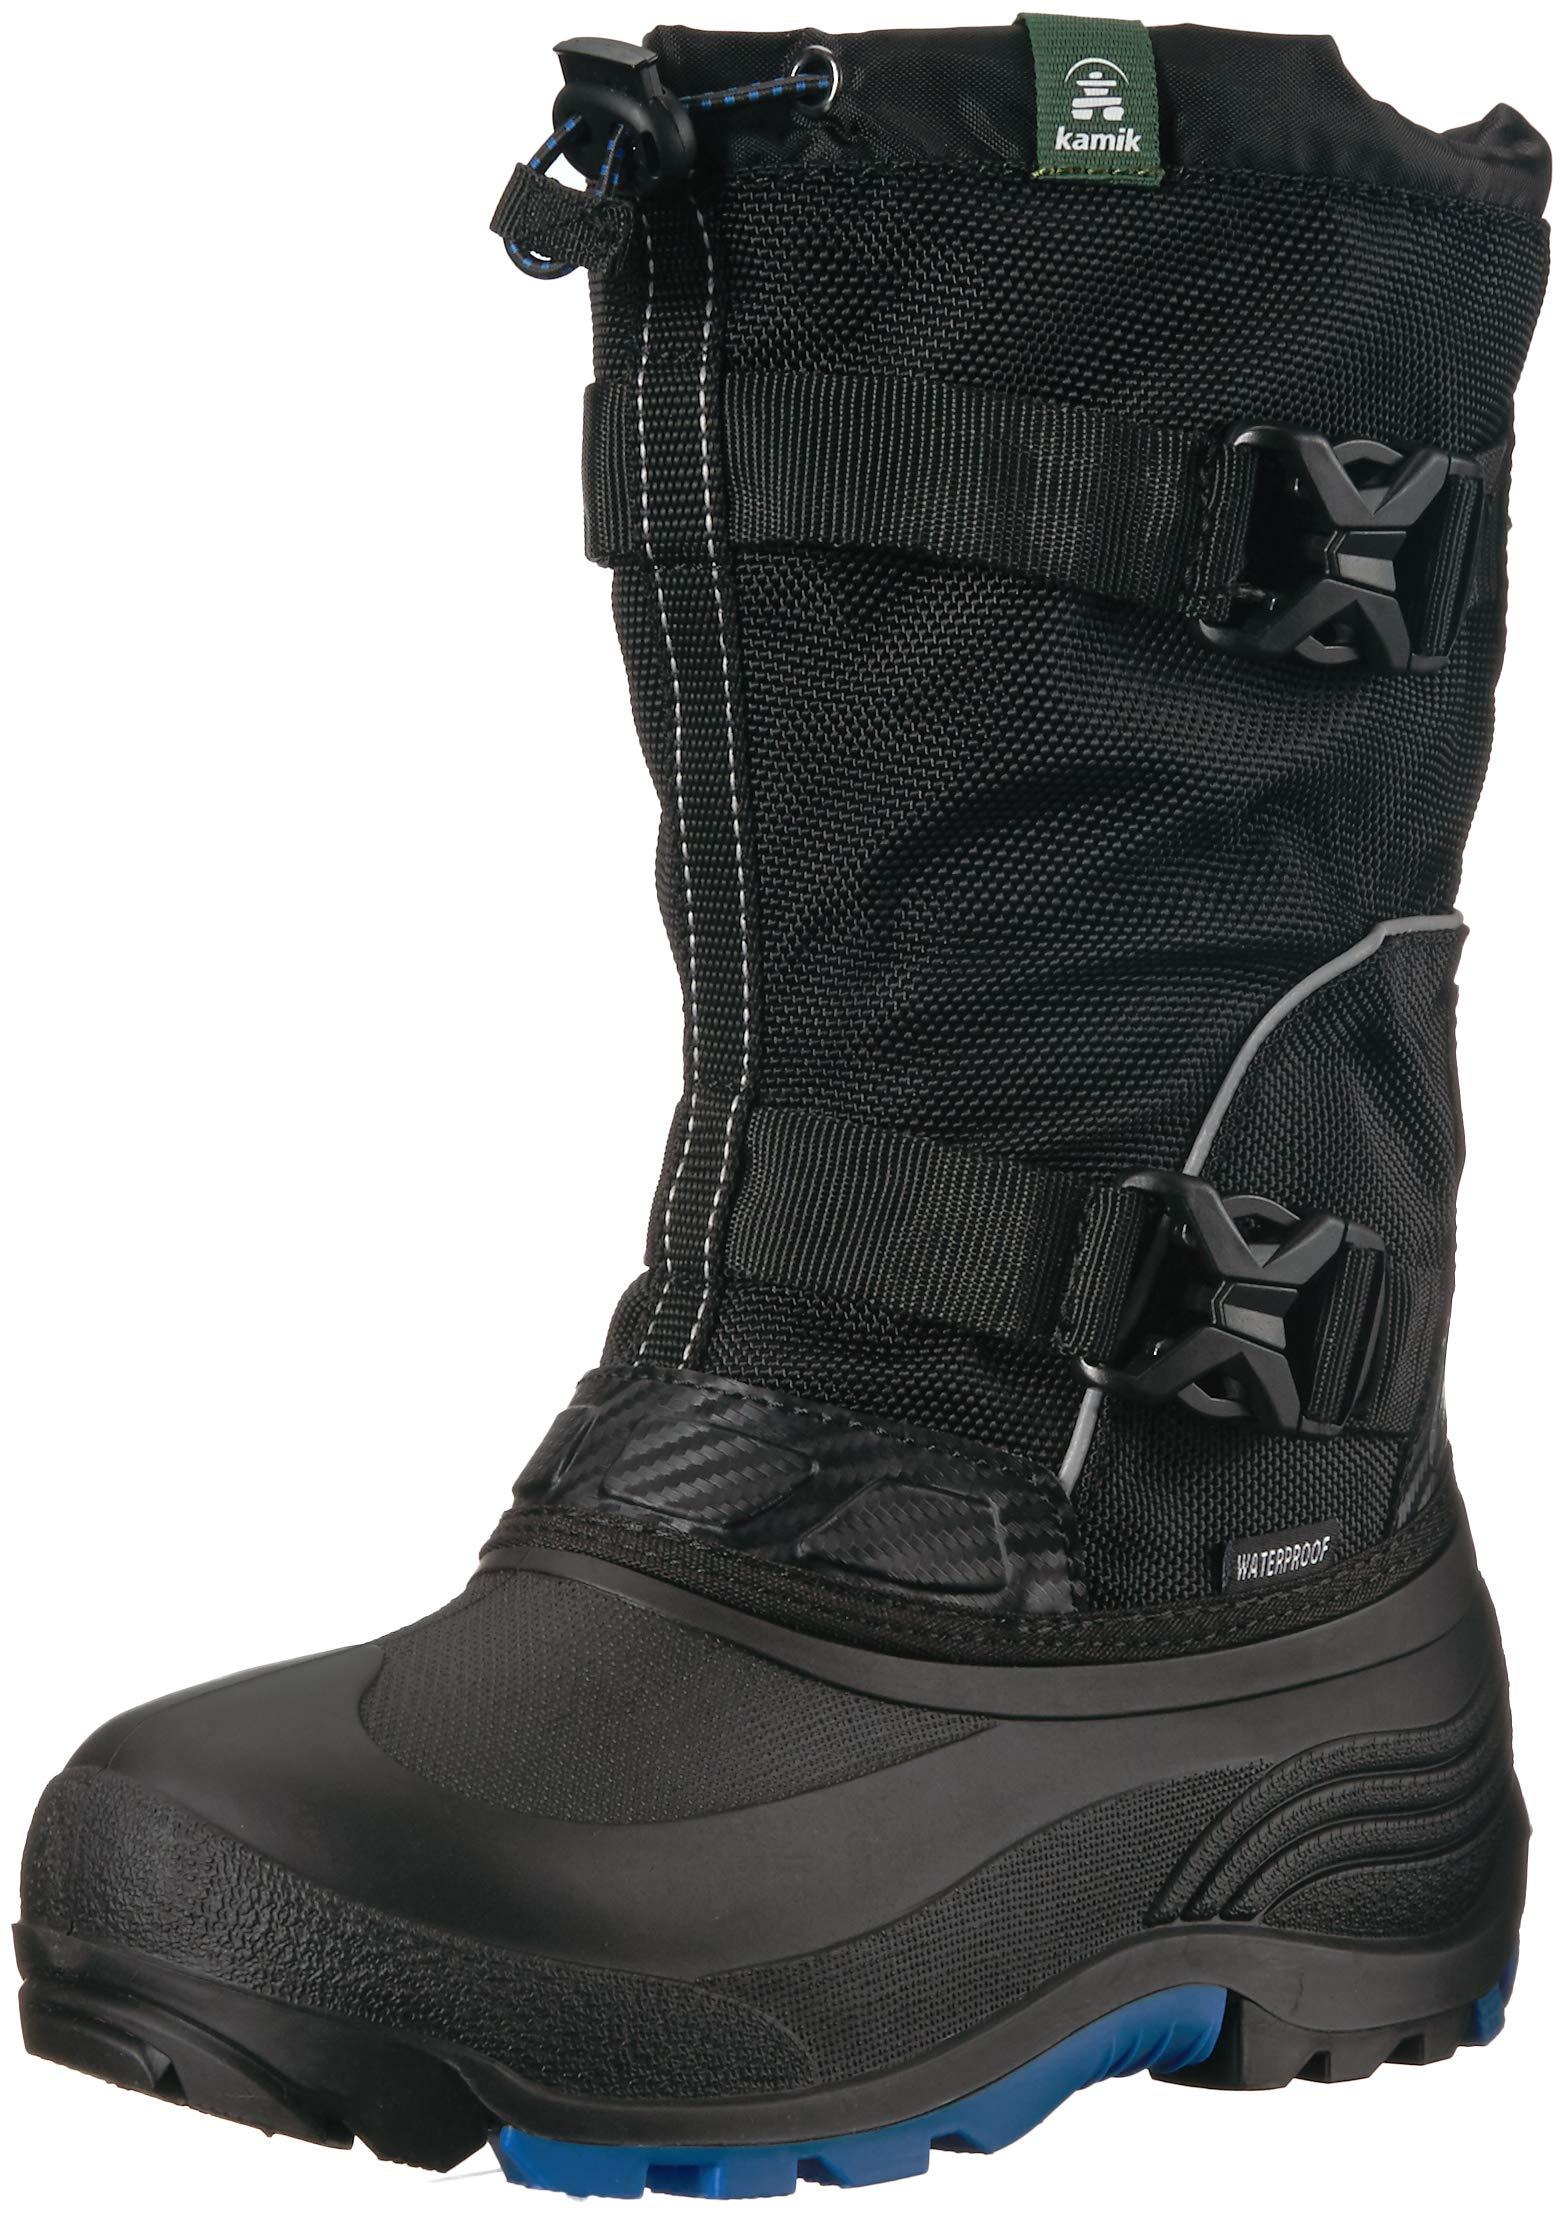 Kamik Boys' GLACIAL2 Snow Boot Black/Blue 4 Medium US Big Kid